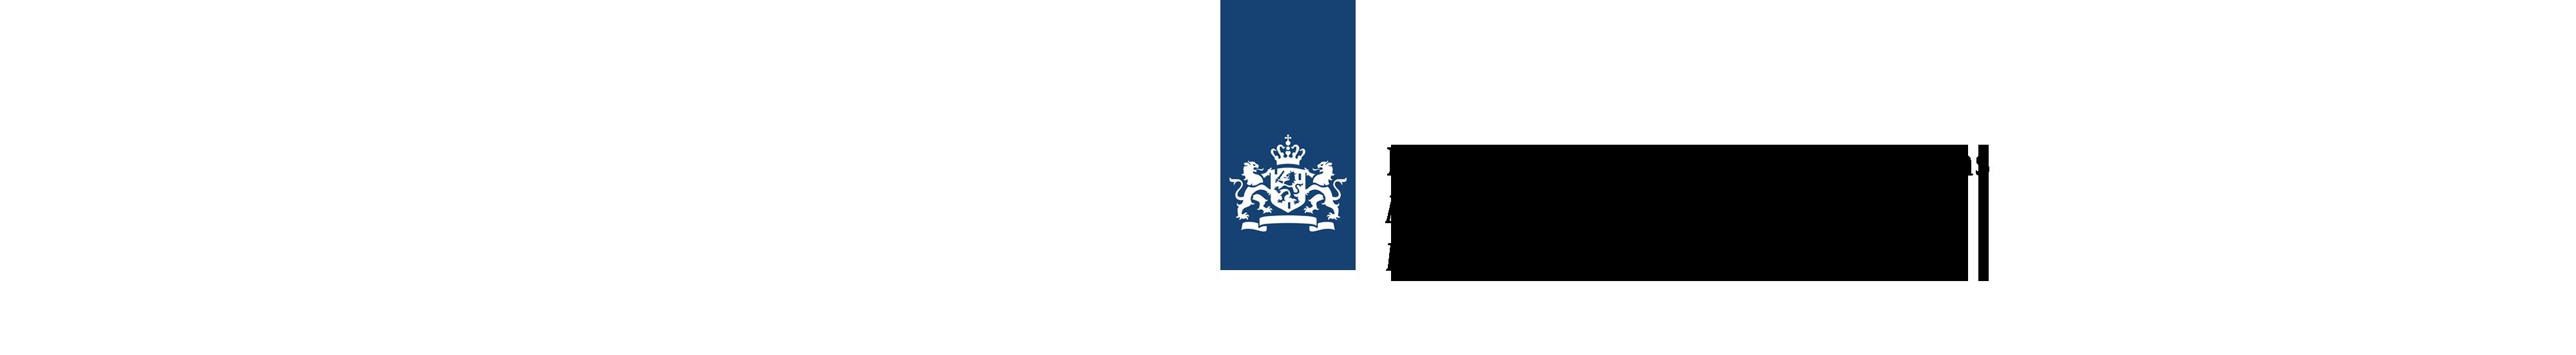 Logo Rijksdienst voor Identiteitsgegevens